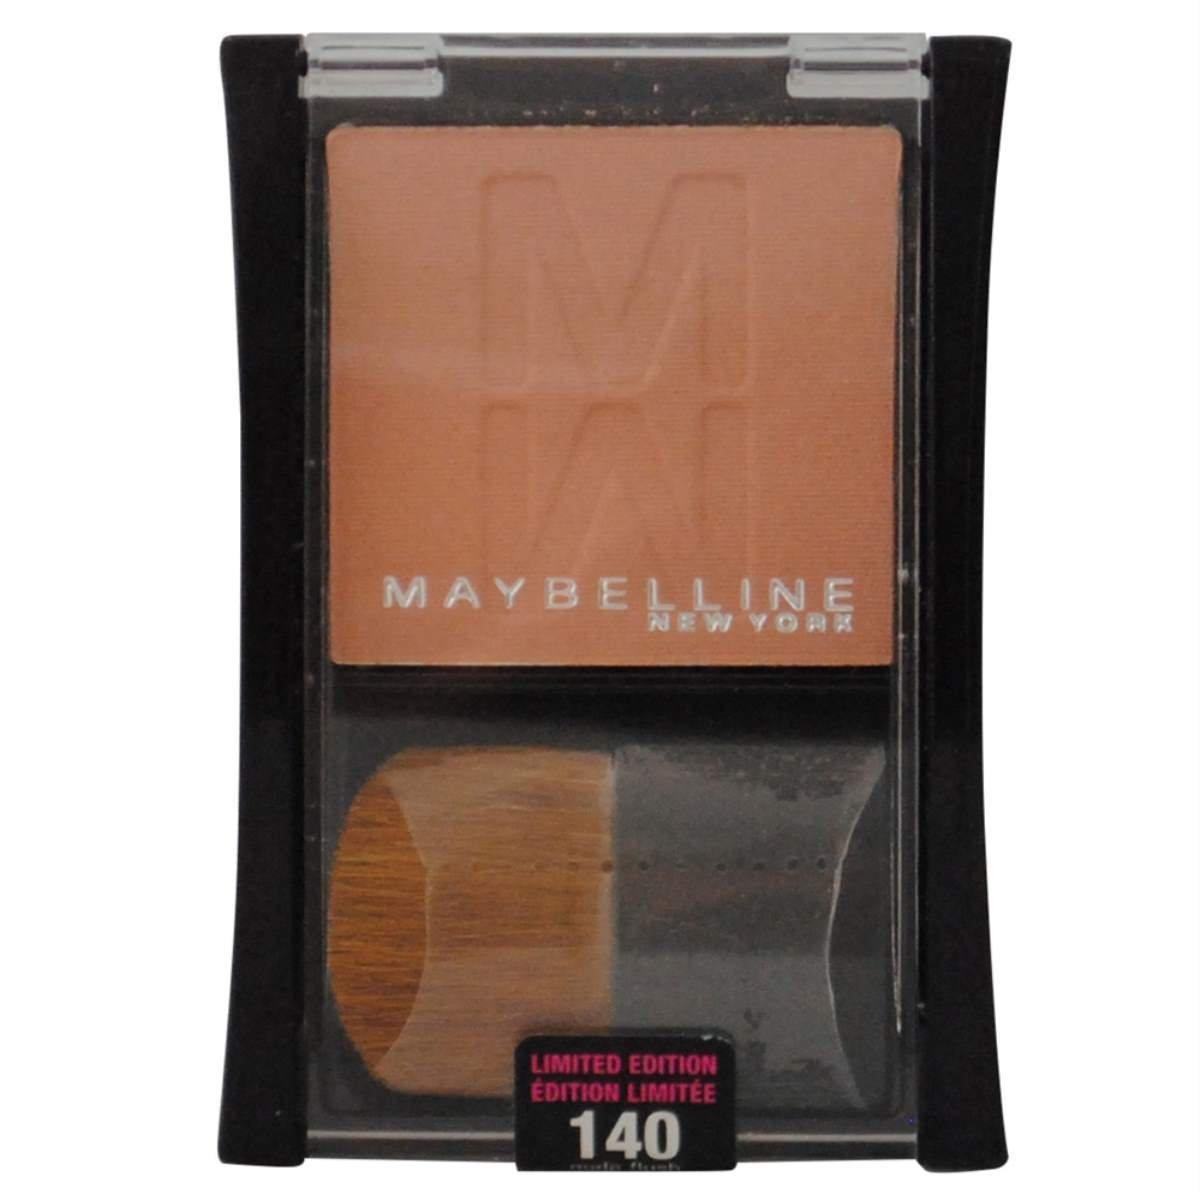 Maybelline Expert Wear Blush # 140 Nude Flush: Amazon.es: Belleza